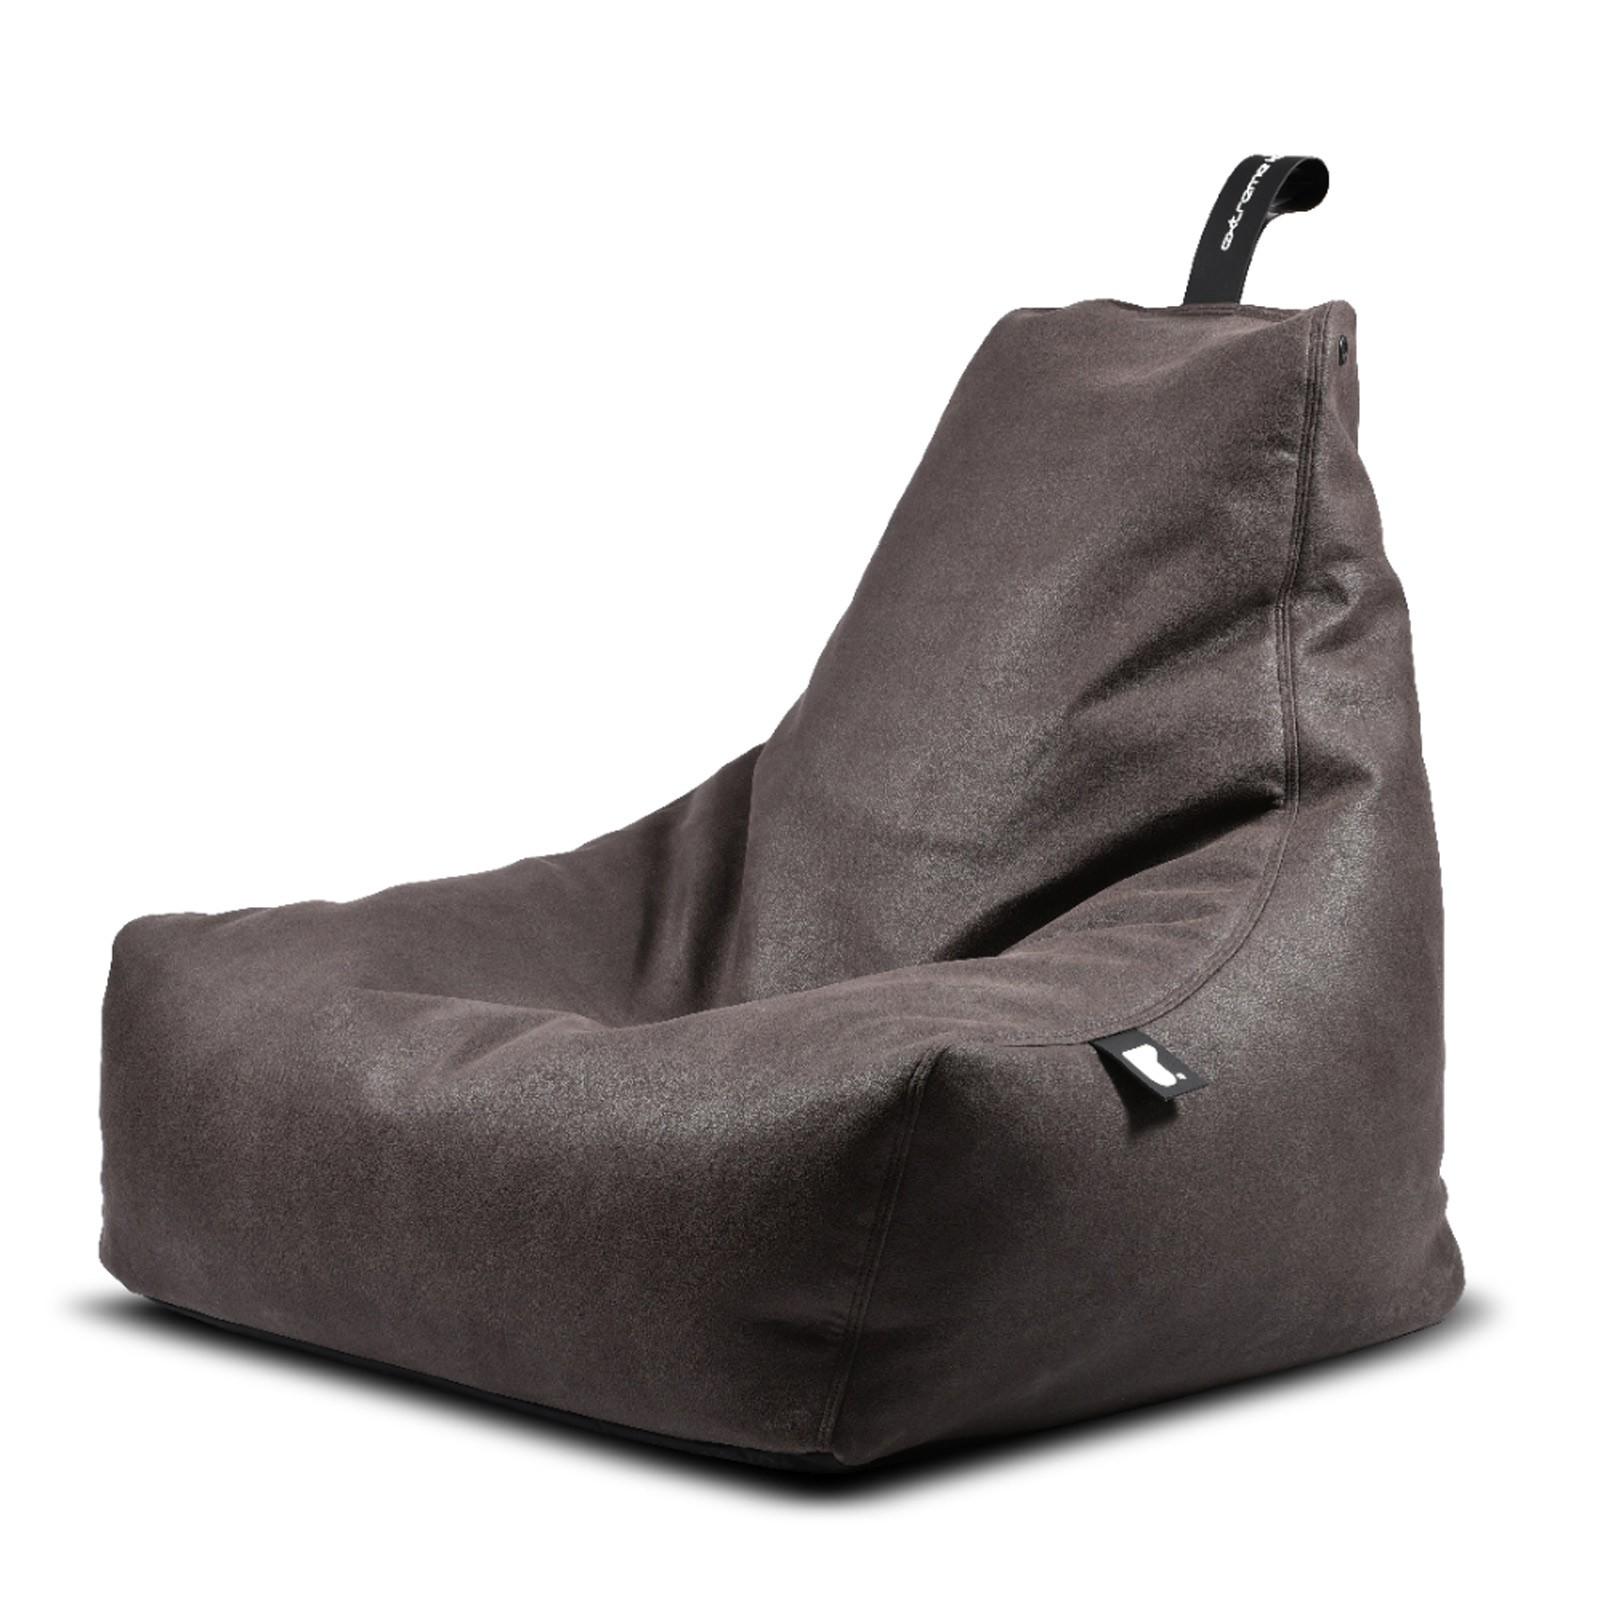 b-bag Extreme Lounging Sitzsack Lederoptik mighty-b, Farbe Slate